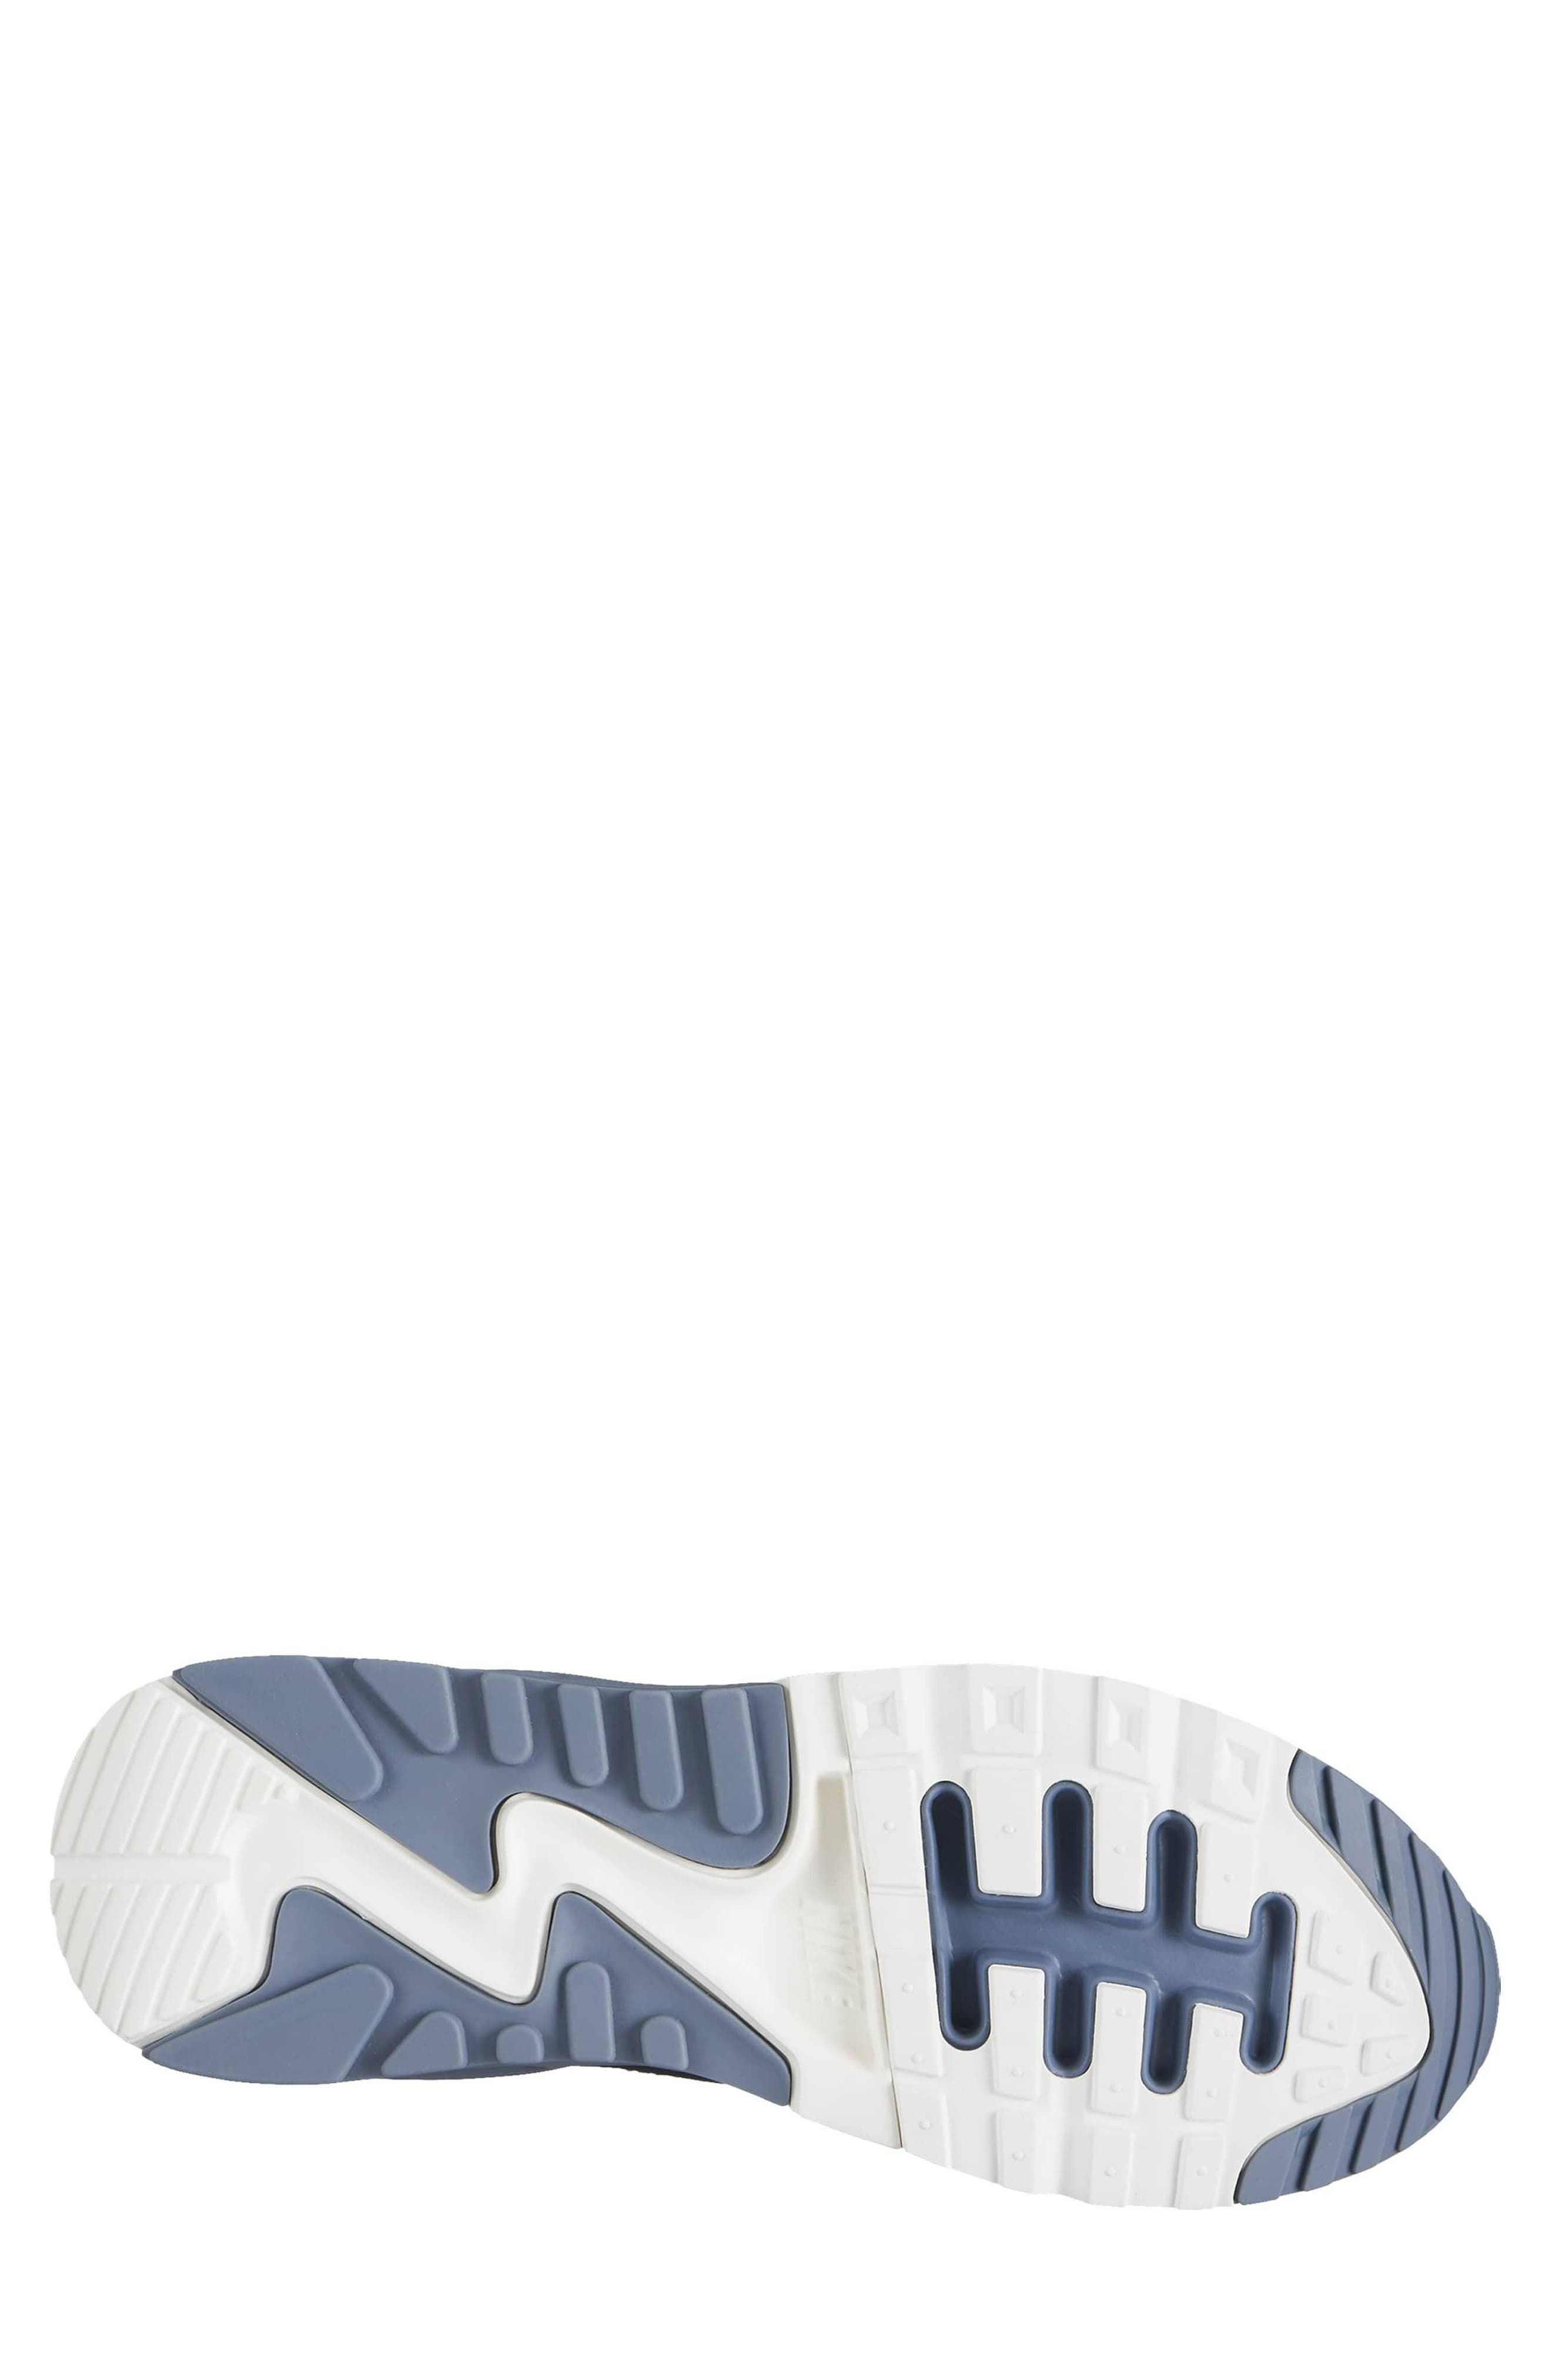 Air Max 90 Flyknit Ultra 2.0 Sneaker,                             Alternate thumbnail 15, color,